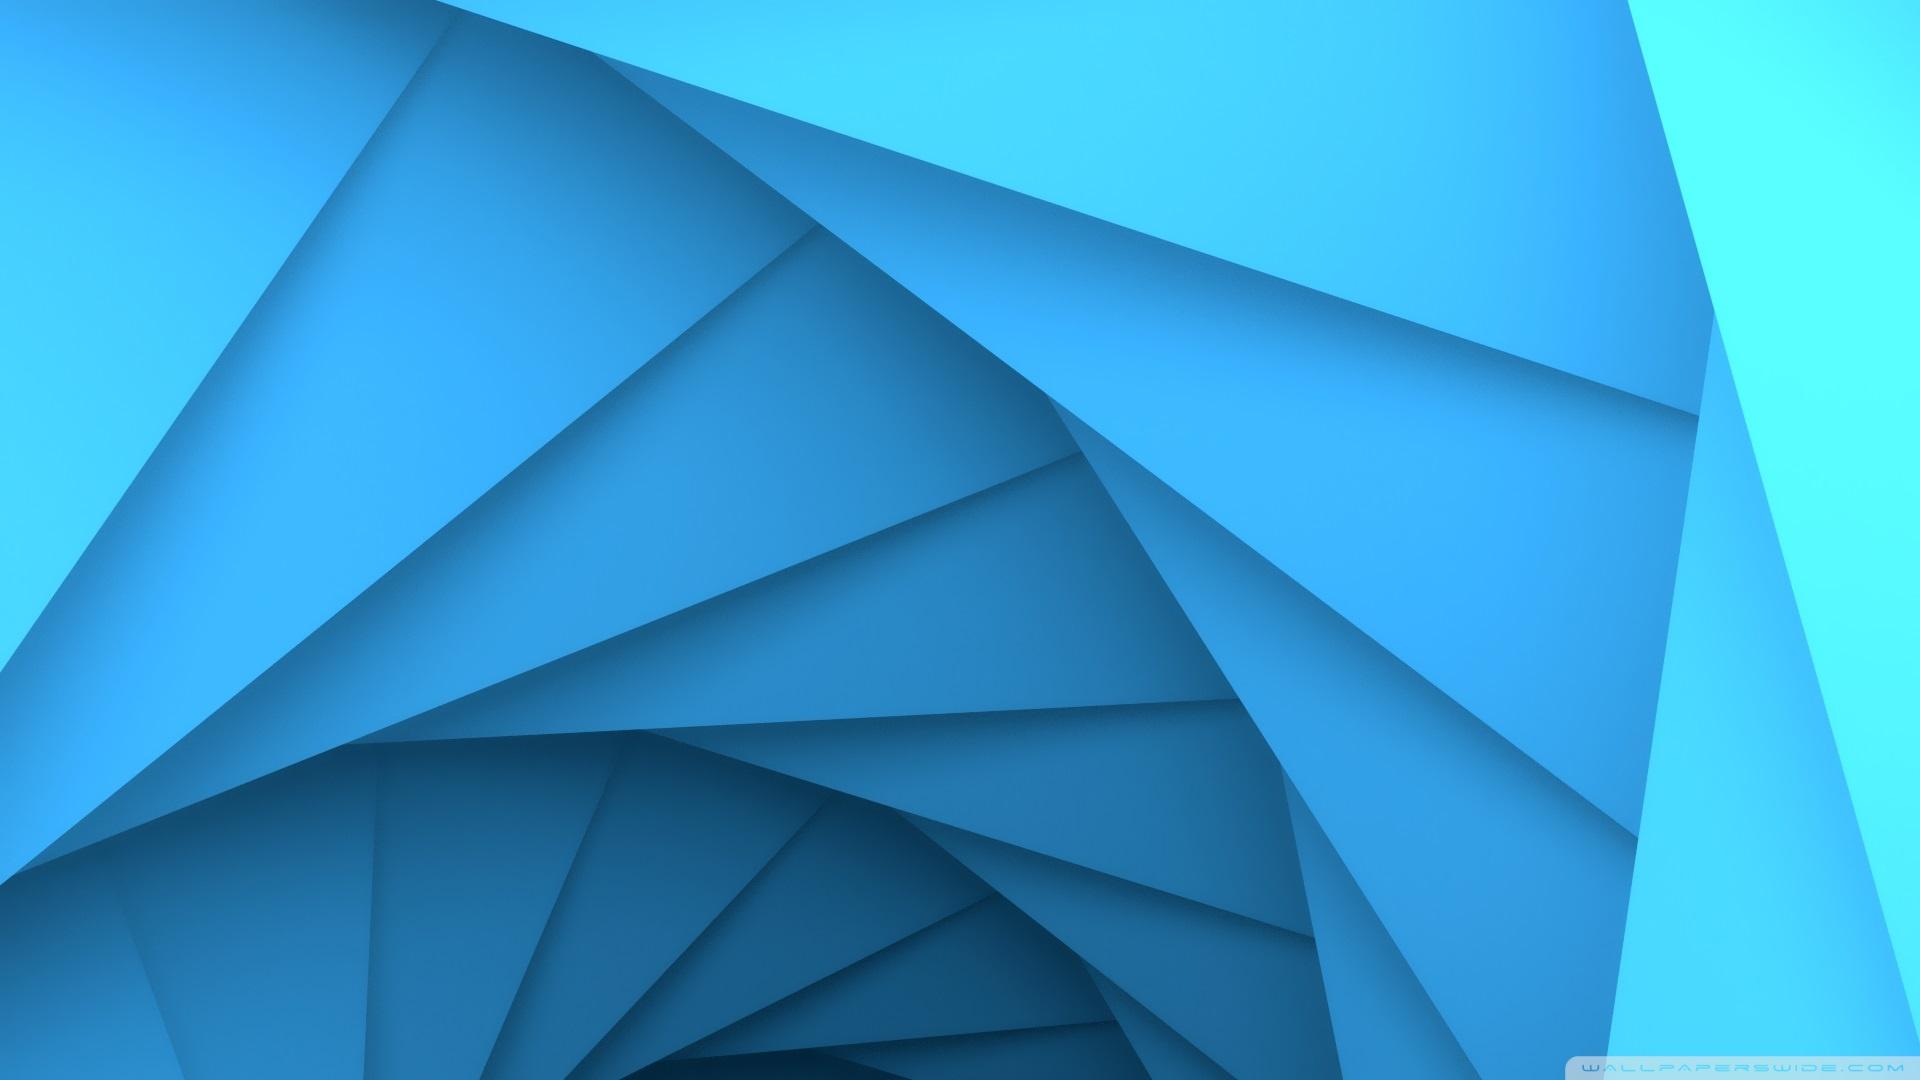 geometry dash background ideas 1920x1080 download hd wallpaper wallpapertip geometry dash background ideas